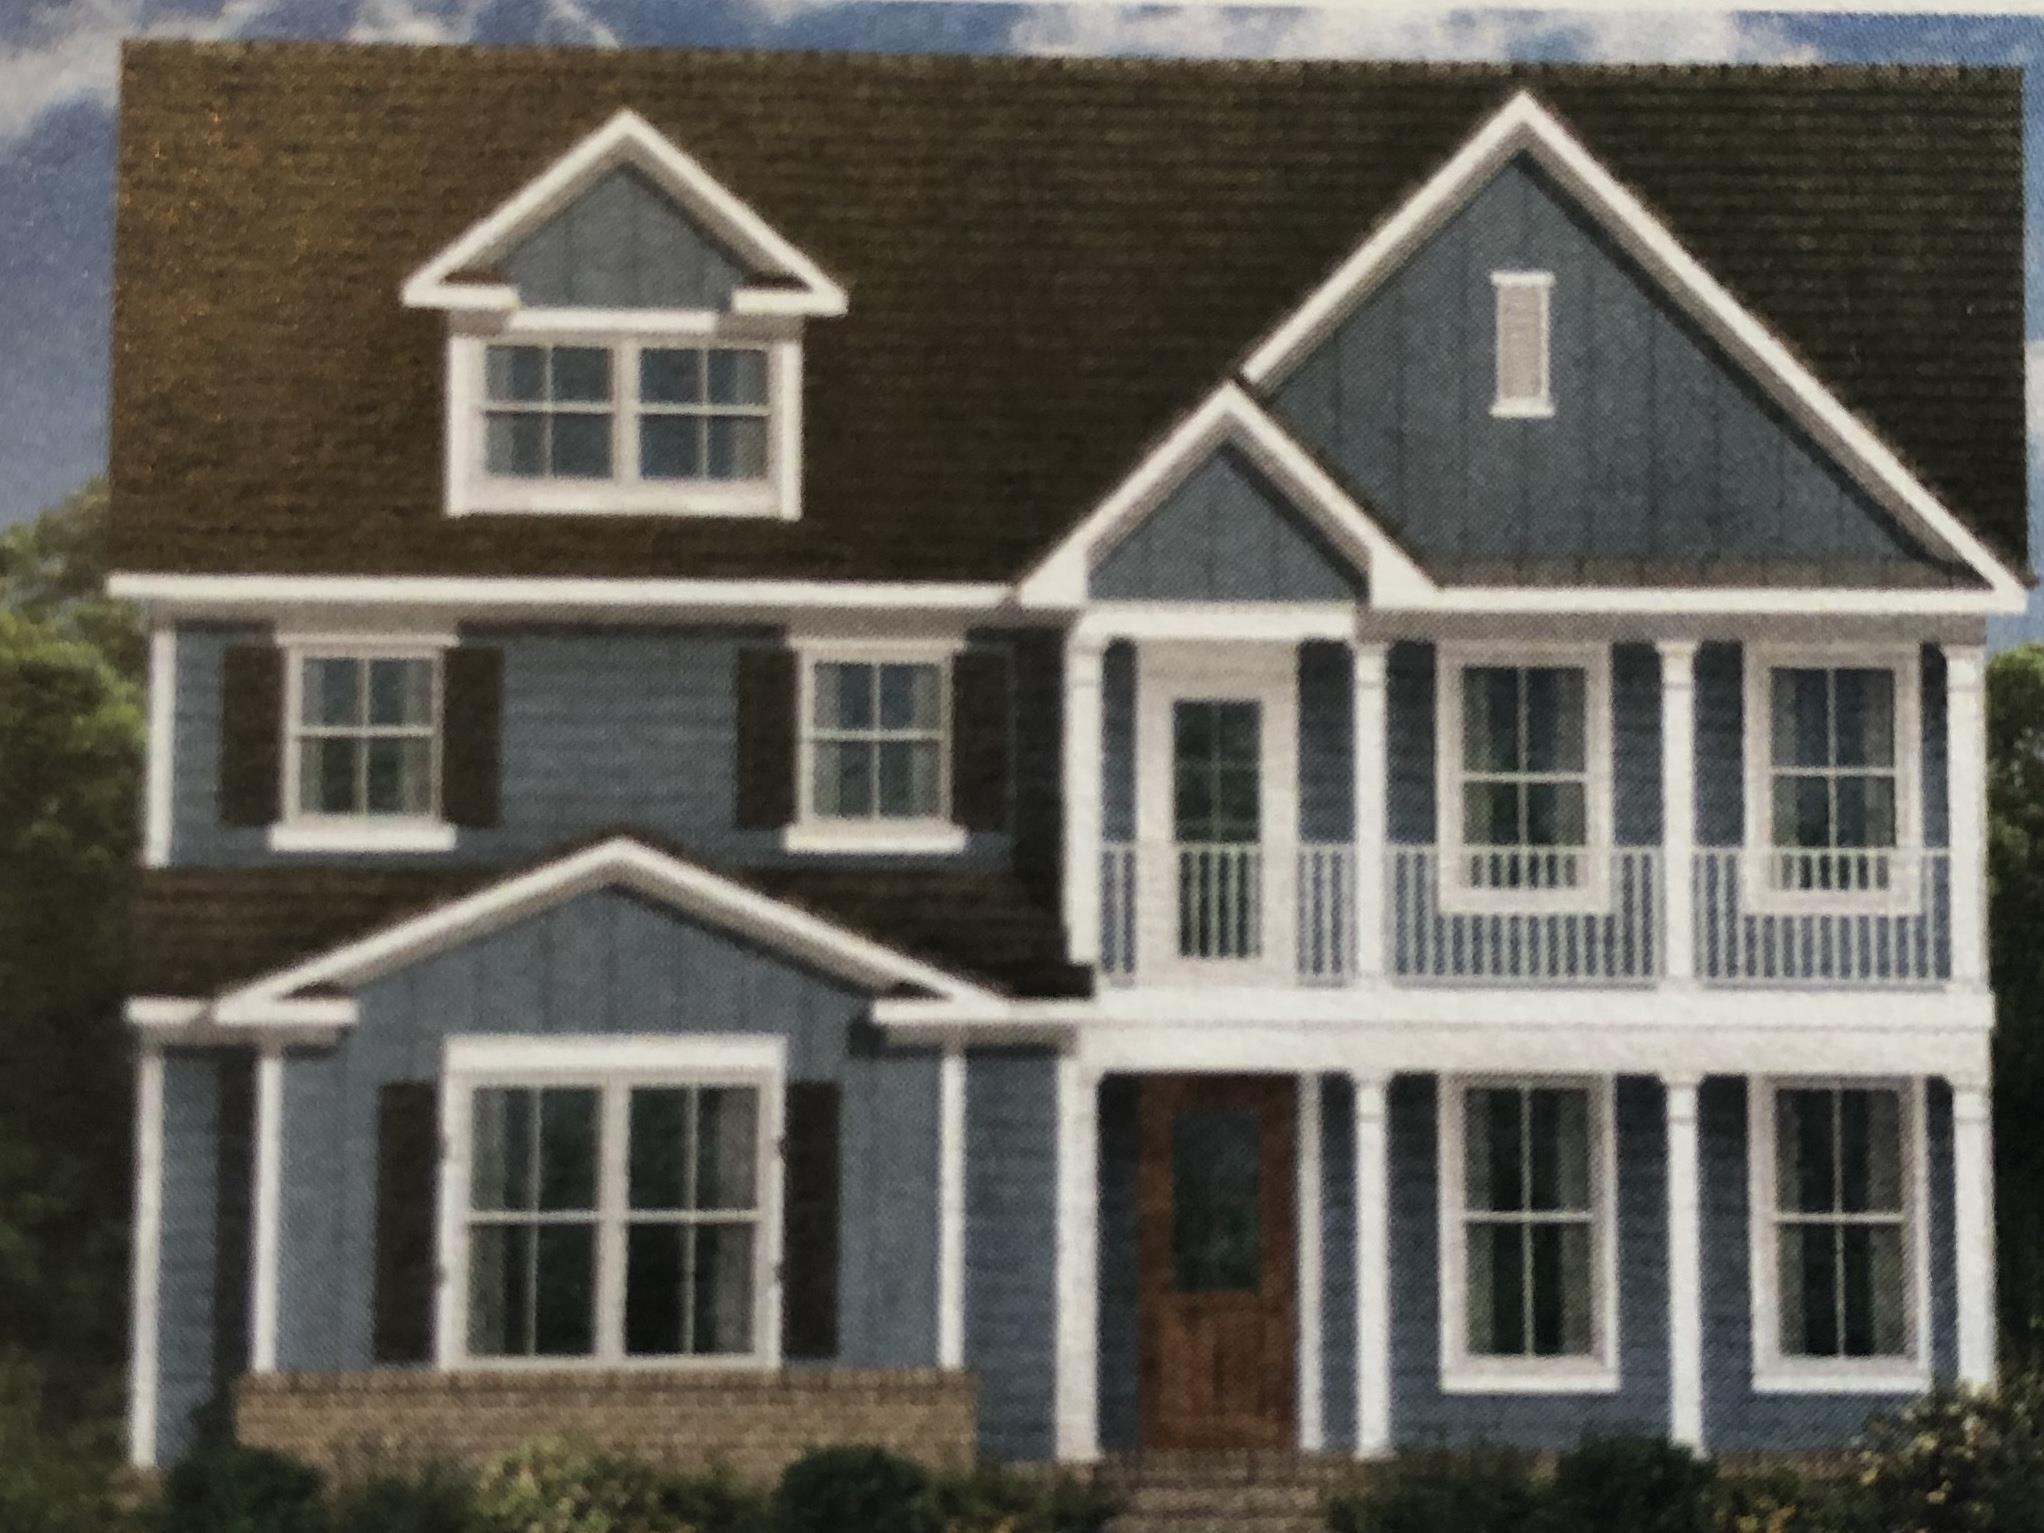 3417 Chinoe Drive- LOT 101, Murfreesboro, TN 37129 - Murfreesboro, TN real estate listing